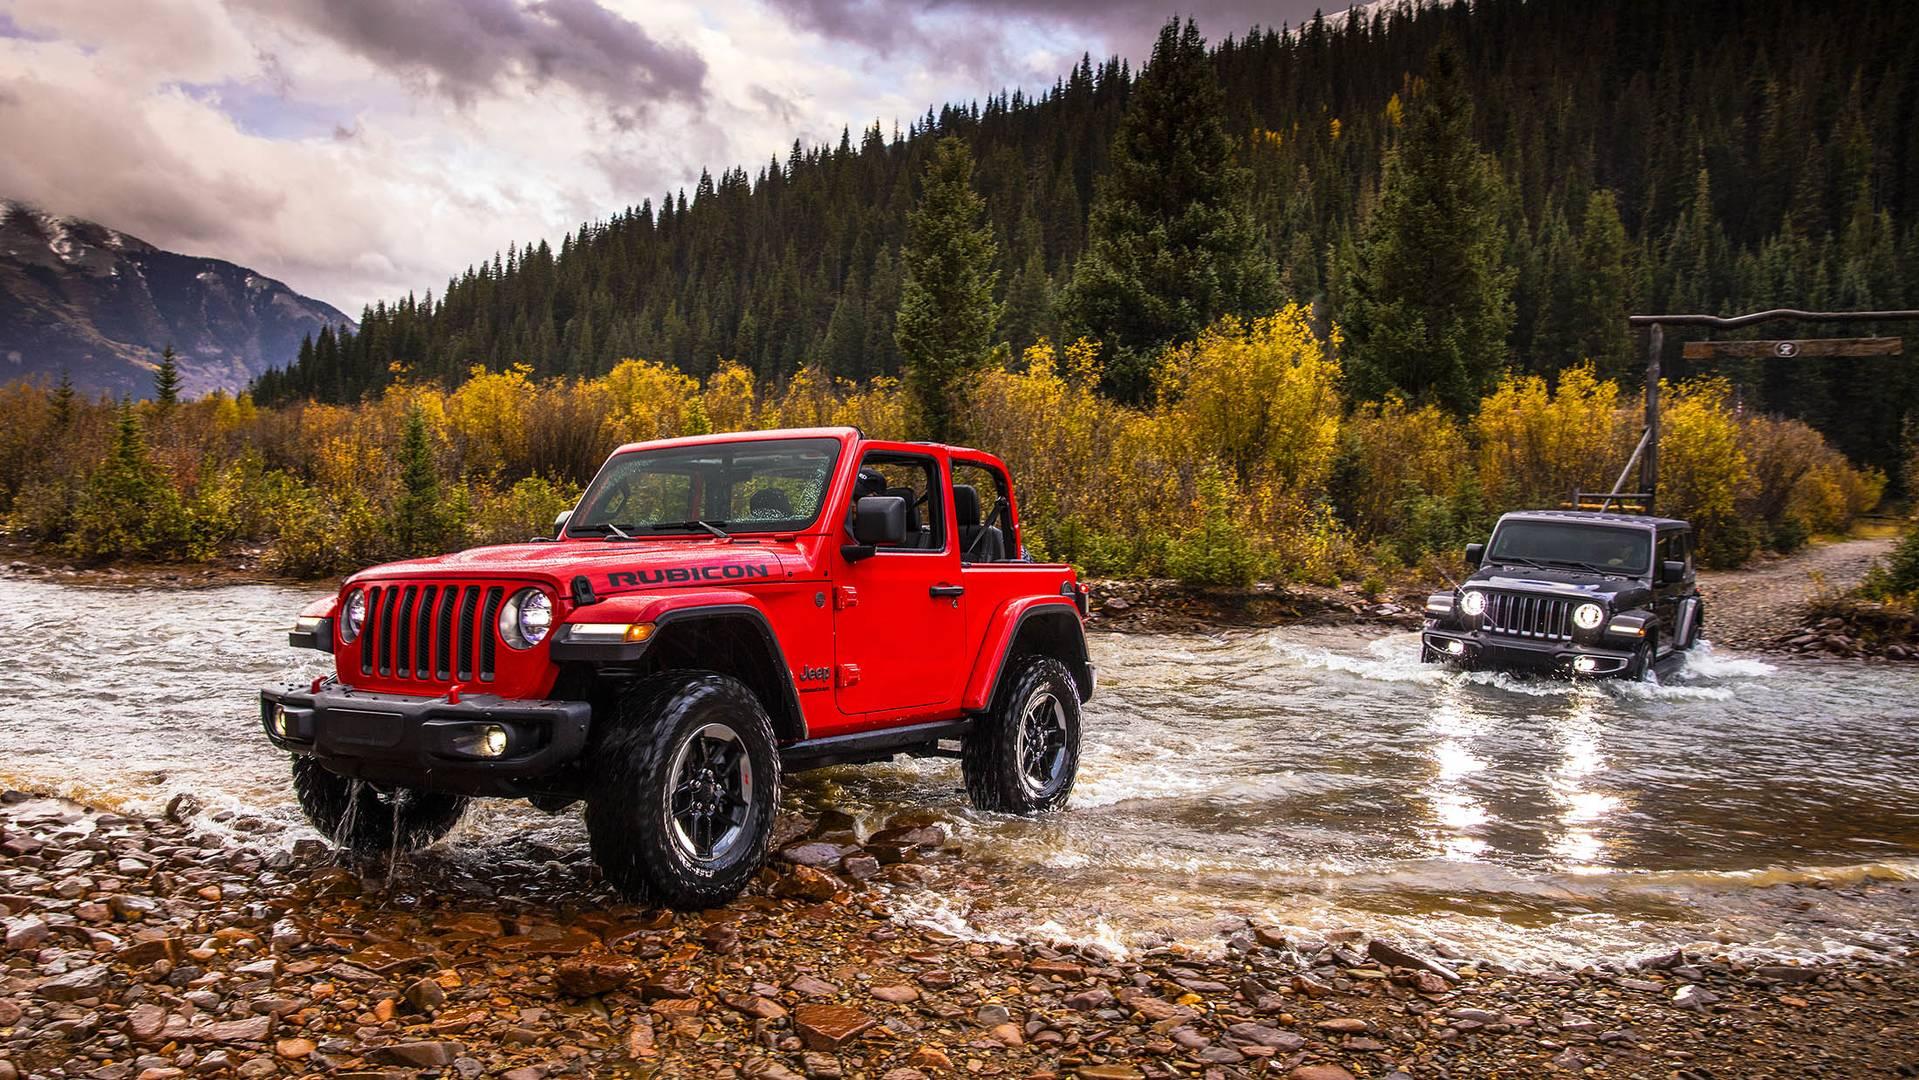 All-new 2018 Jeep® Wrangler Rubicon and All-new 2018 Jeep® Wrangler Sahara